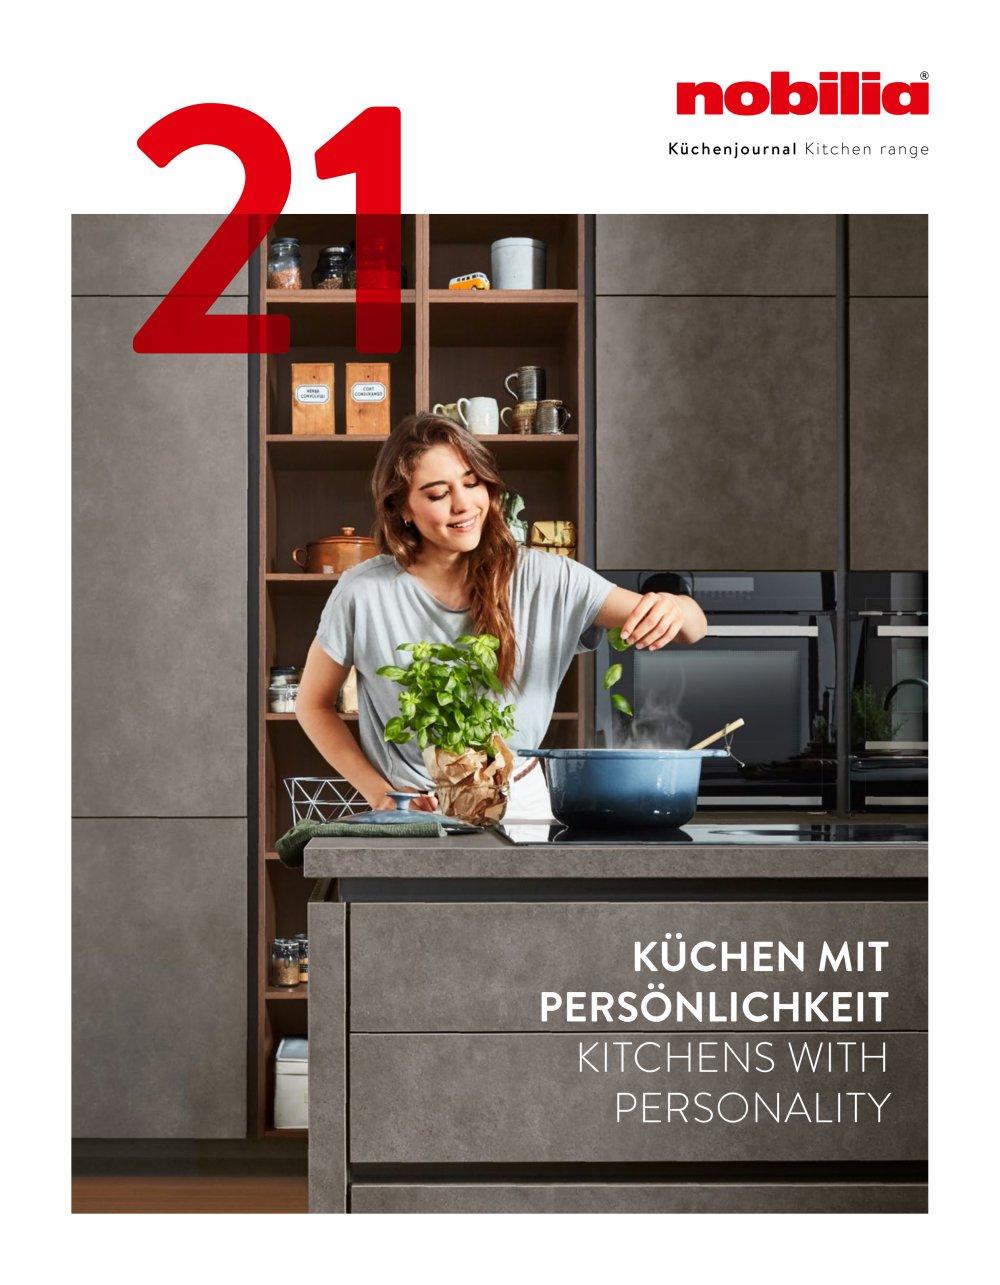 NOBILIA KITCHEN JOURNAL - nobilia - PDF Catalogues | Documentation ...